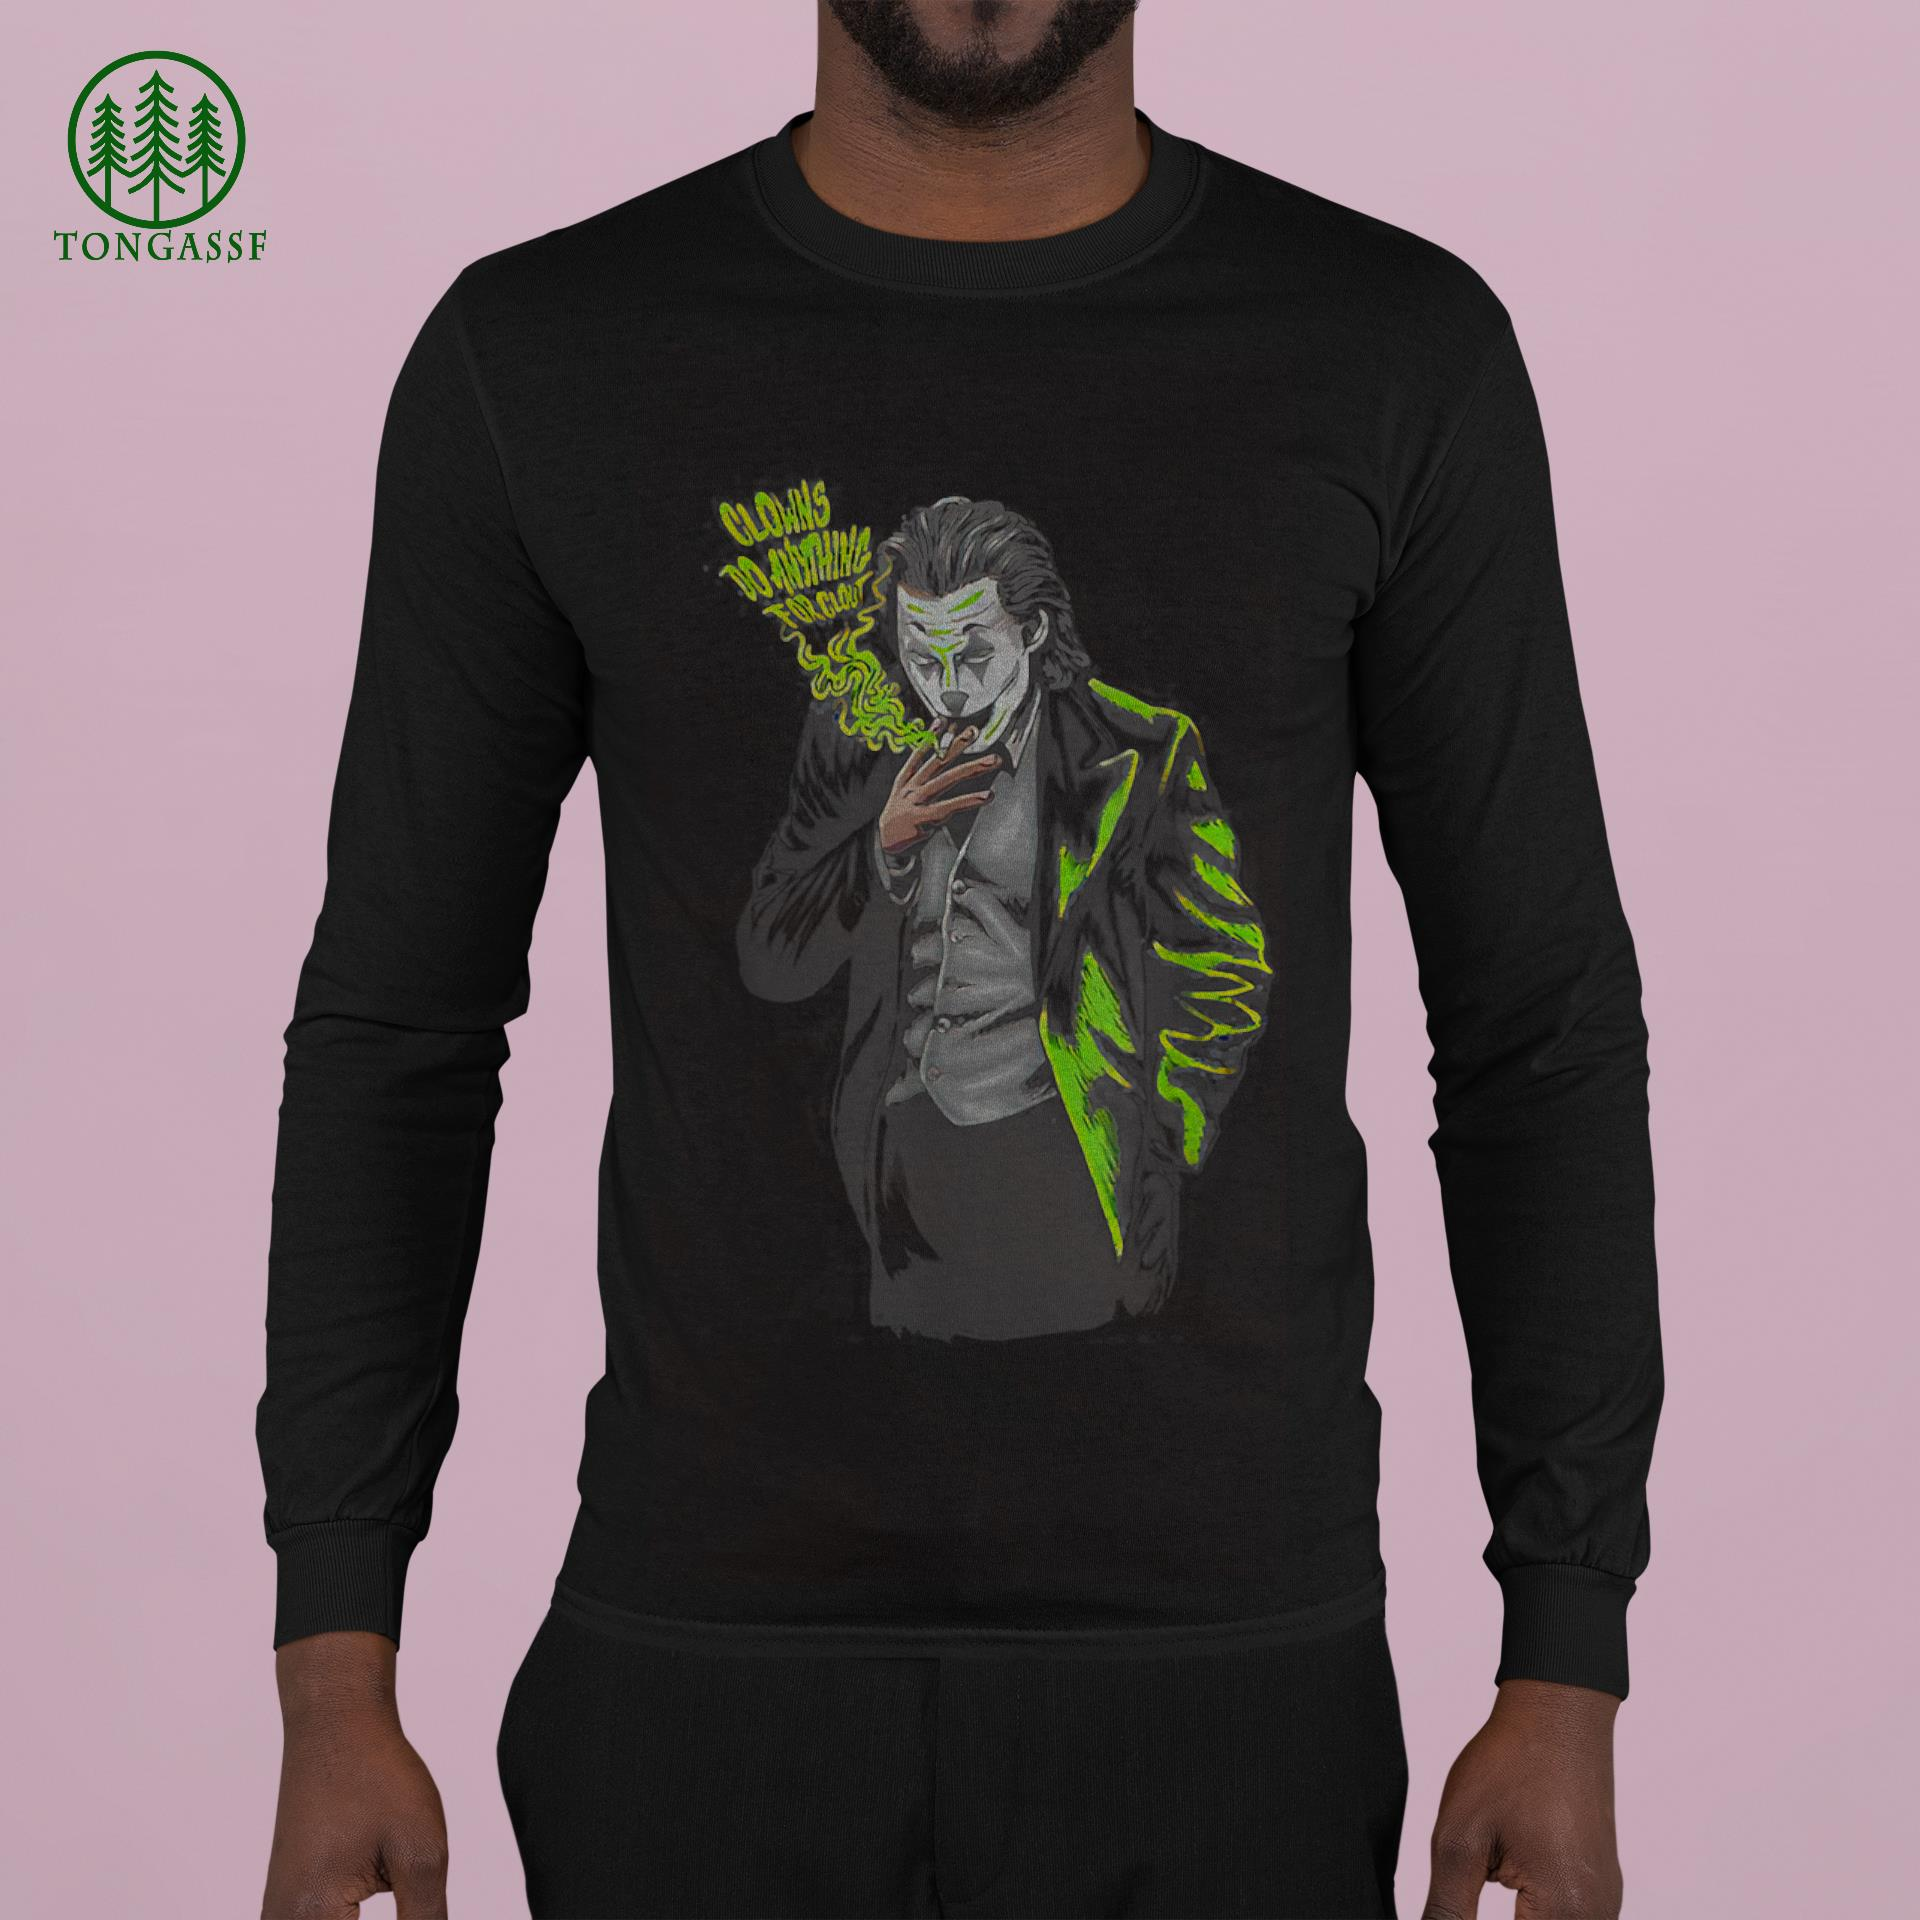 Graphic Match Jordan 6 Electric Green Shirt